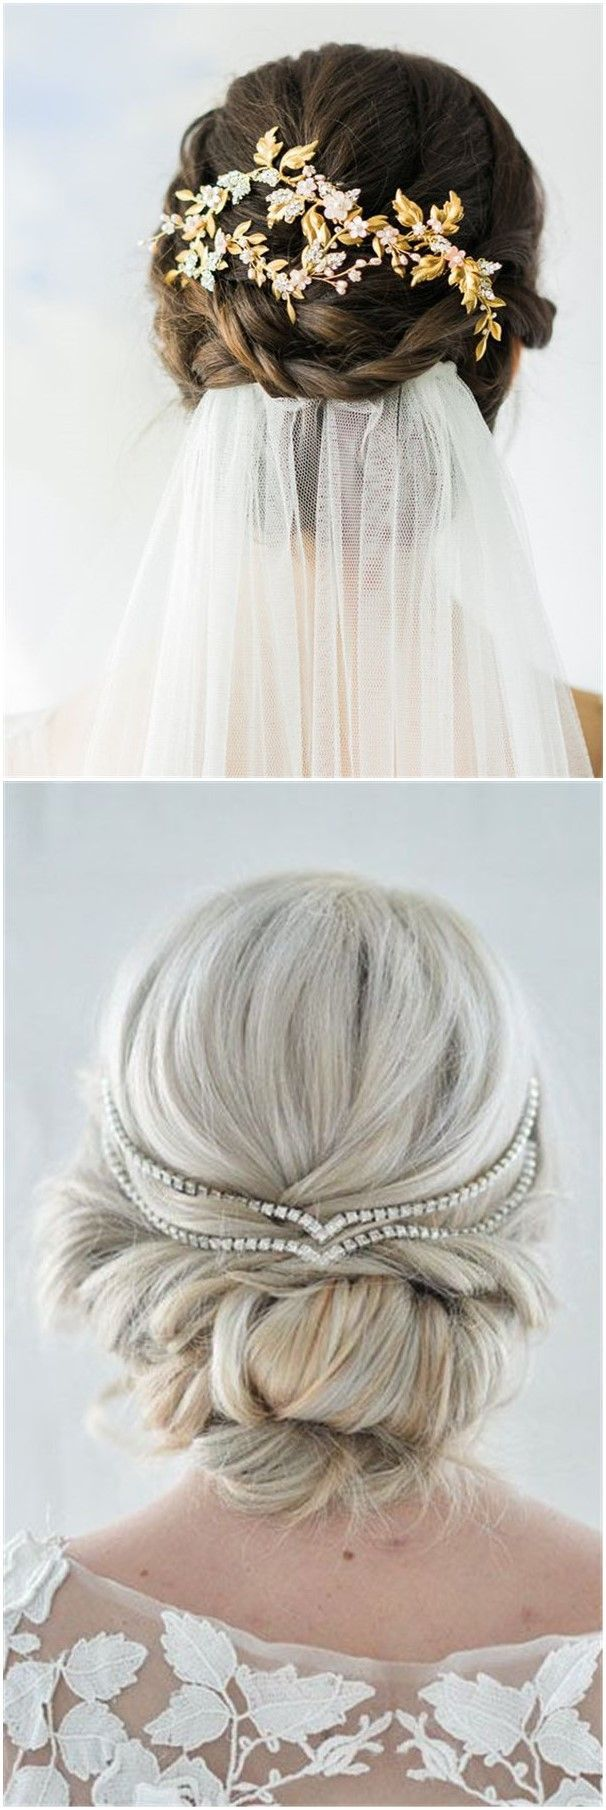 1593 best Wedding Hairstyles images on Pinterest | Wedding hair ...